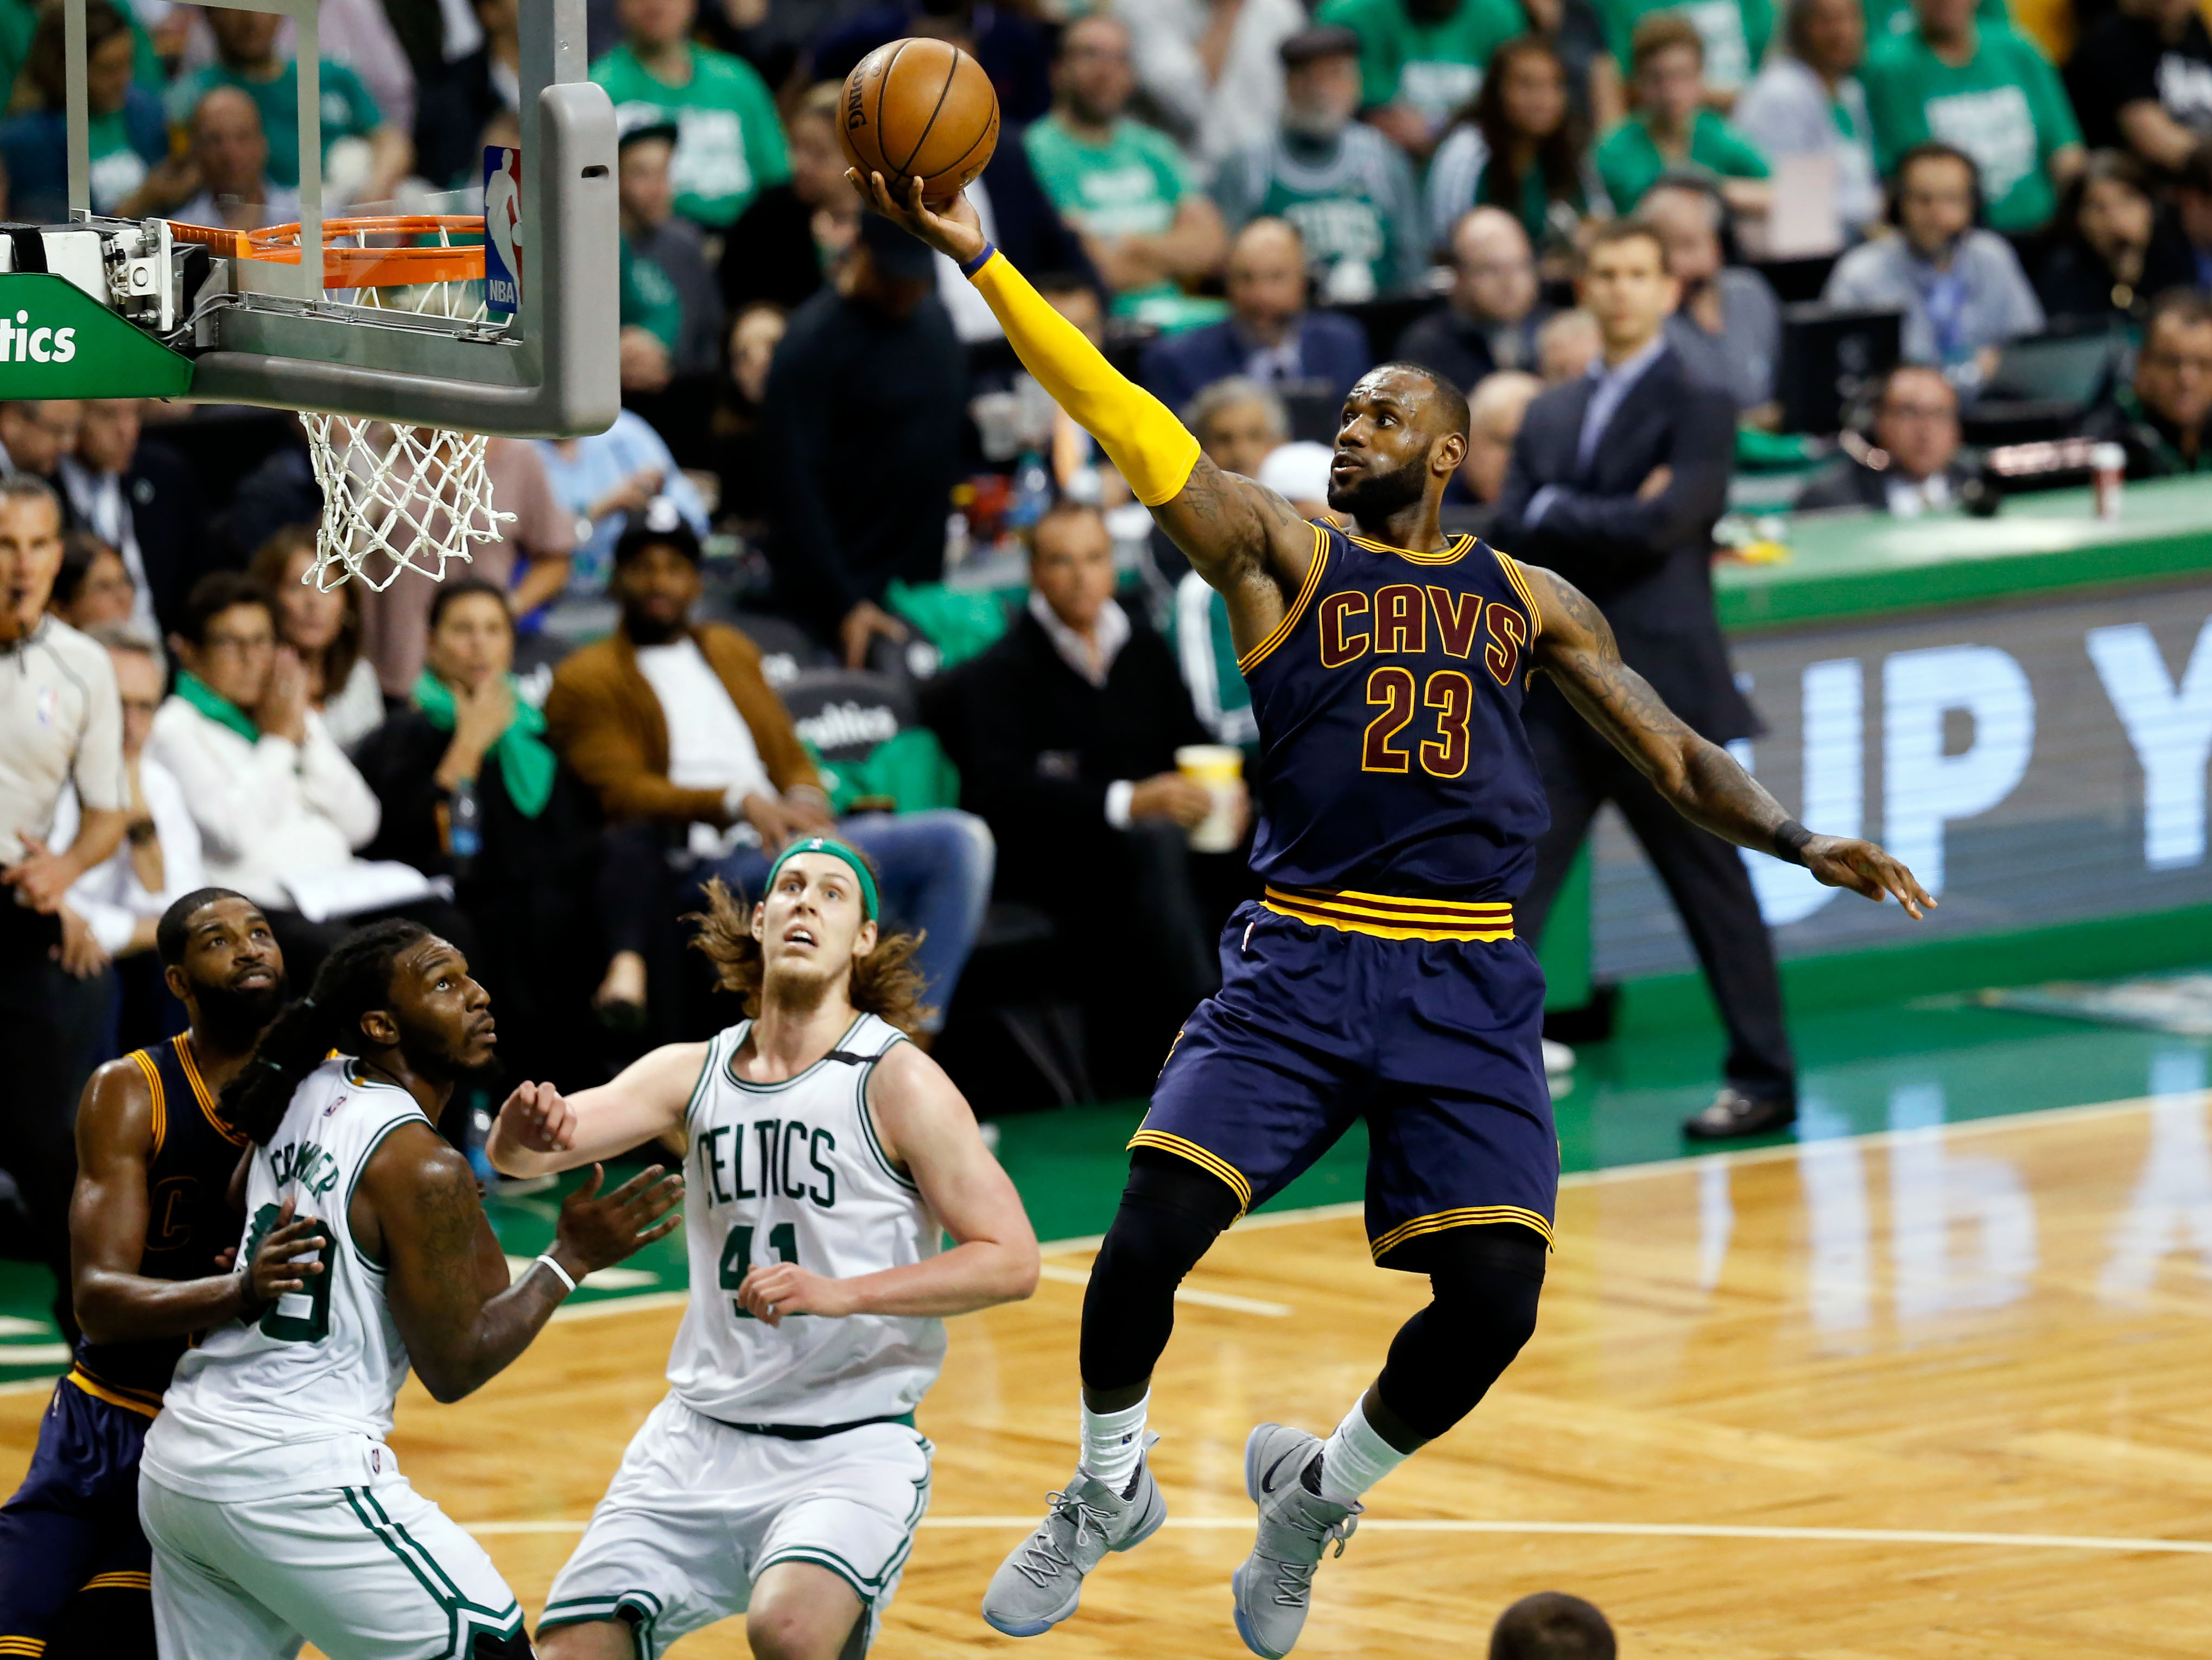 <p>Леброн Джеймс (на снимке справа). Фото: &copy;&nbsp;<span>Greg M. Cooper/USA TODAY Sports/REUTERS</span></p>